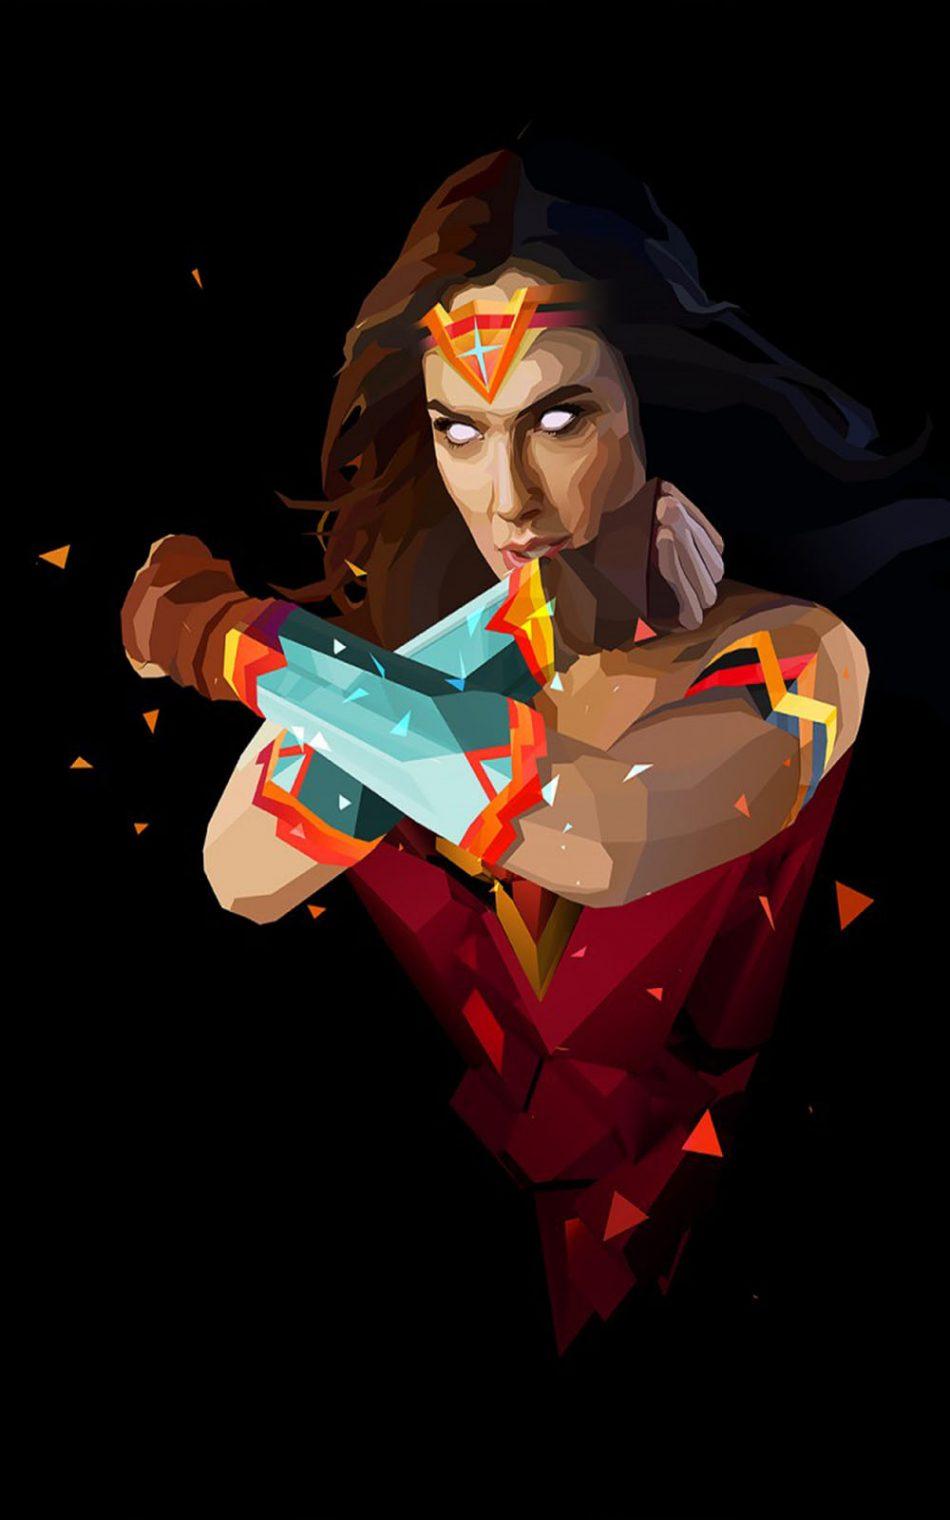 Download Wonder Woman Minimal Free Pure 4k Ultra Hd Mobile